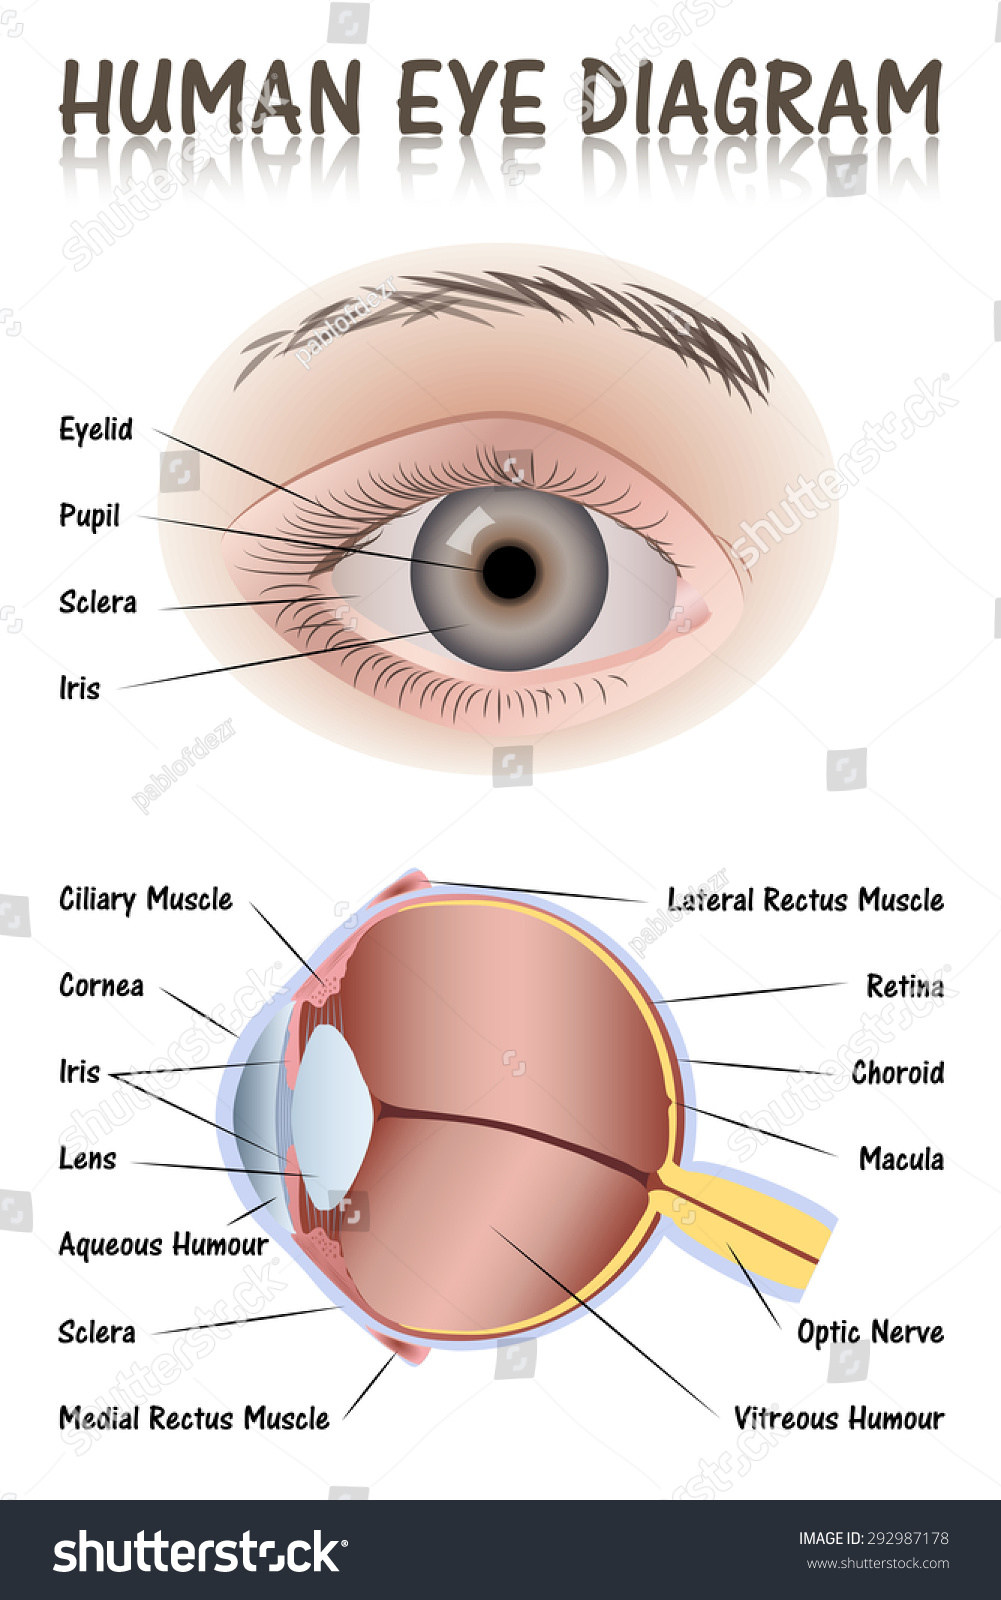 Human eye diagram stock vector 292987178 shutterstock pooptronica Choice Image